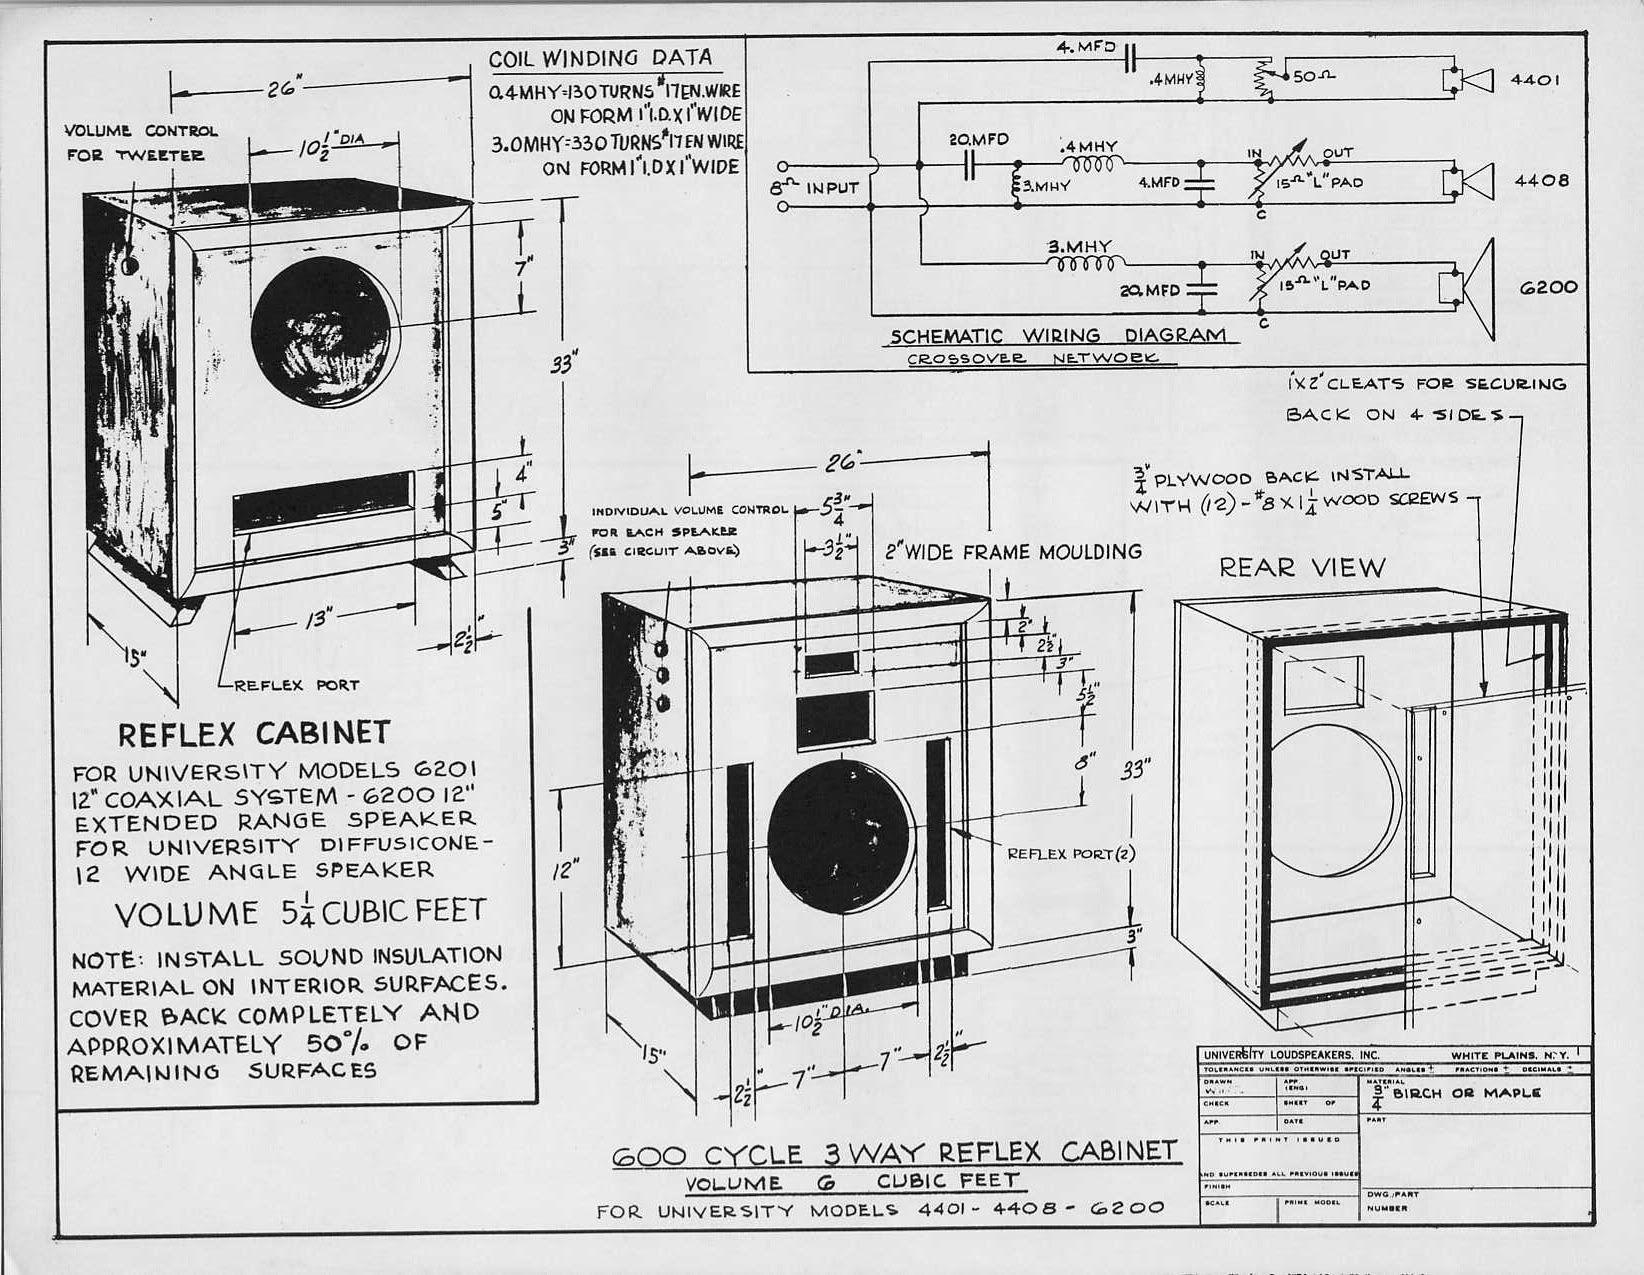 speaker cabinets design - Google Search  sc 1 st  Pinterest & speaker cabinets design - Google Search | speakers design ...